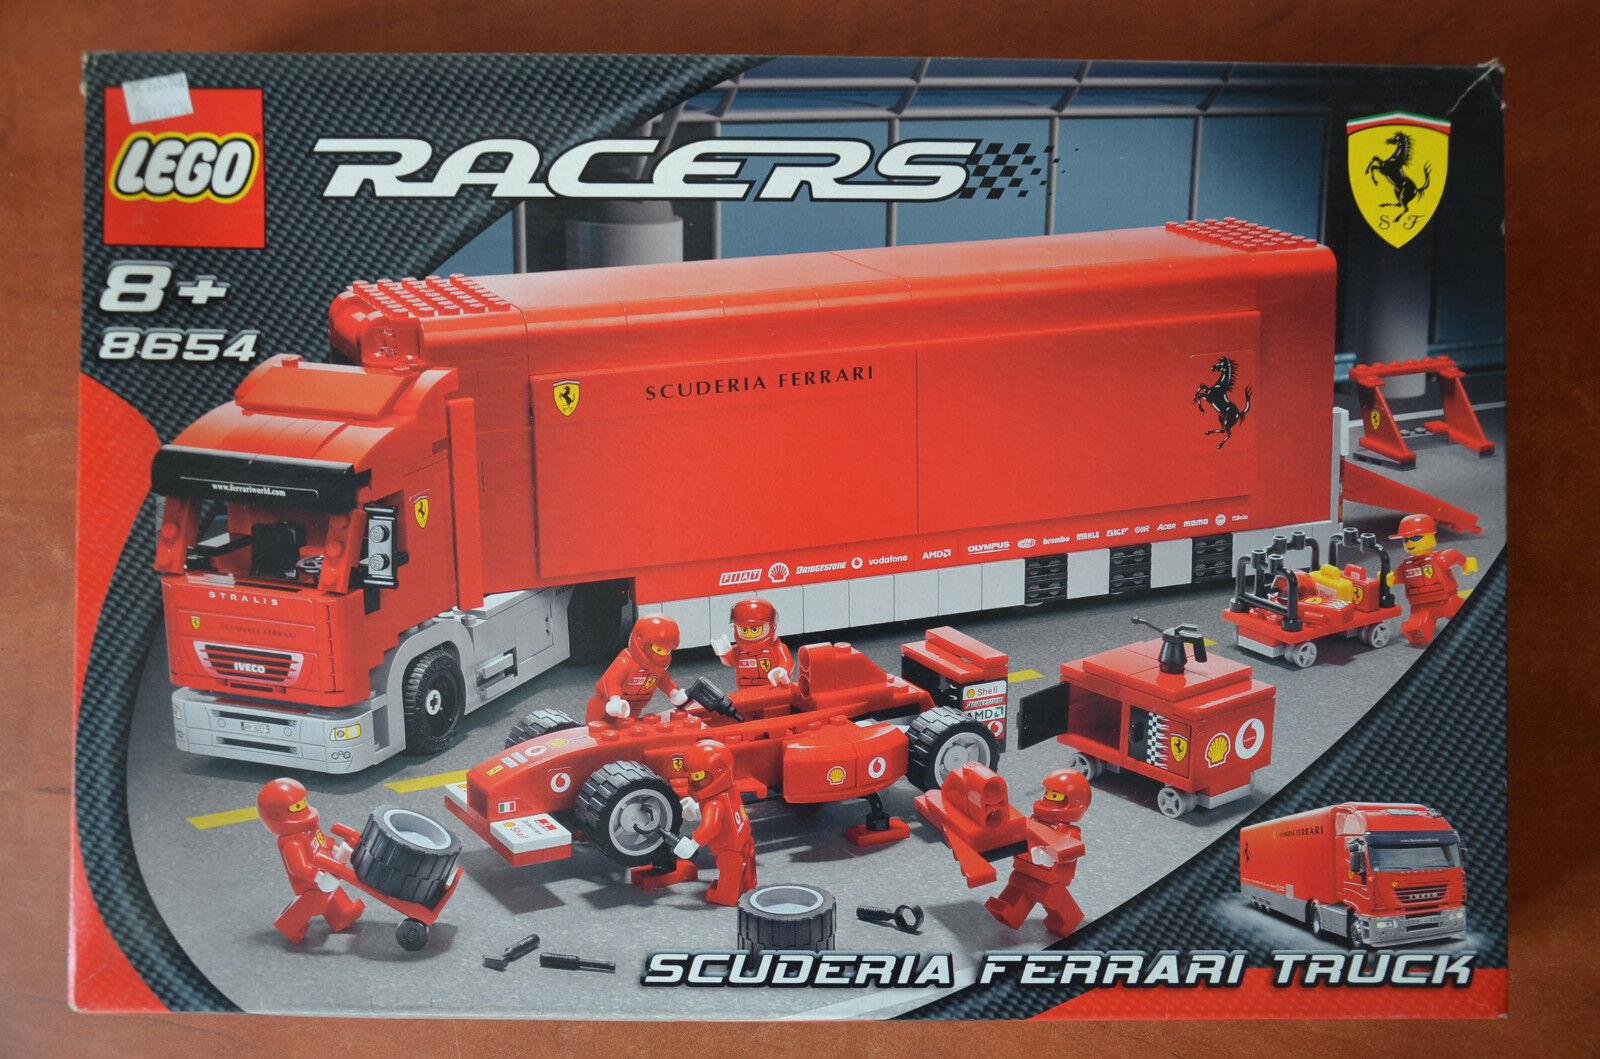 LEGO 8654 RACERS Scuderia Ferrari Truck Truck Truck - complete with manual and original box aebf46